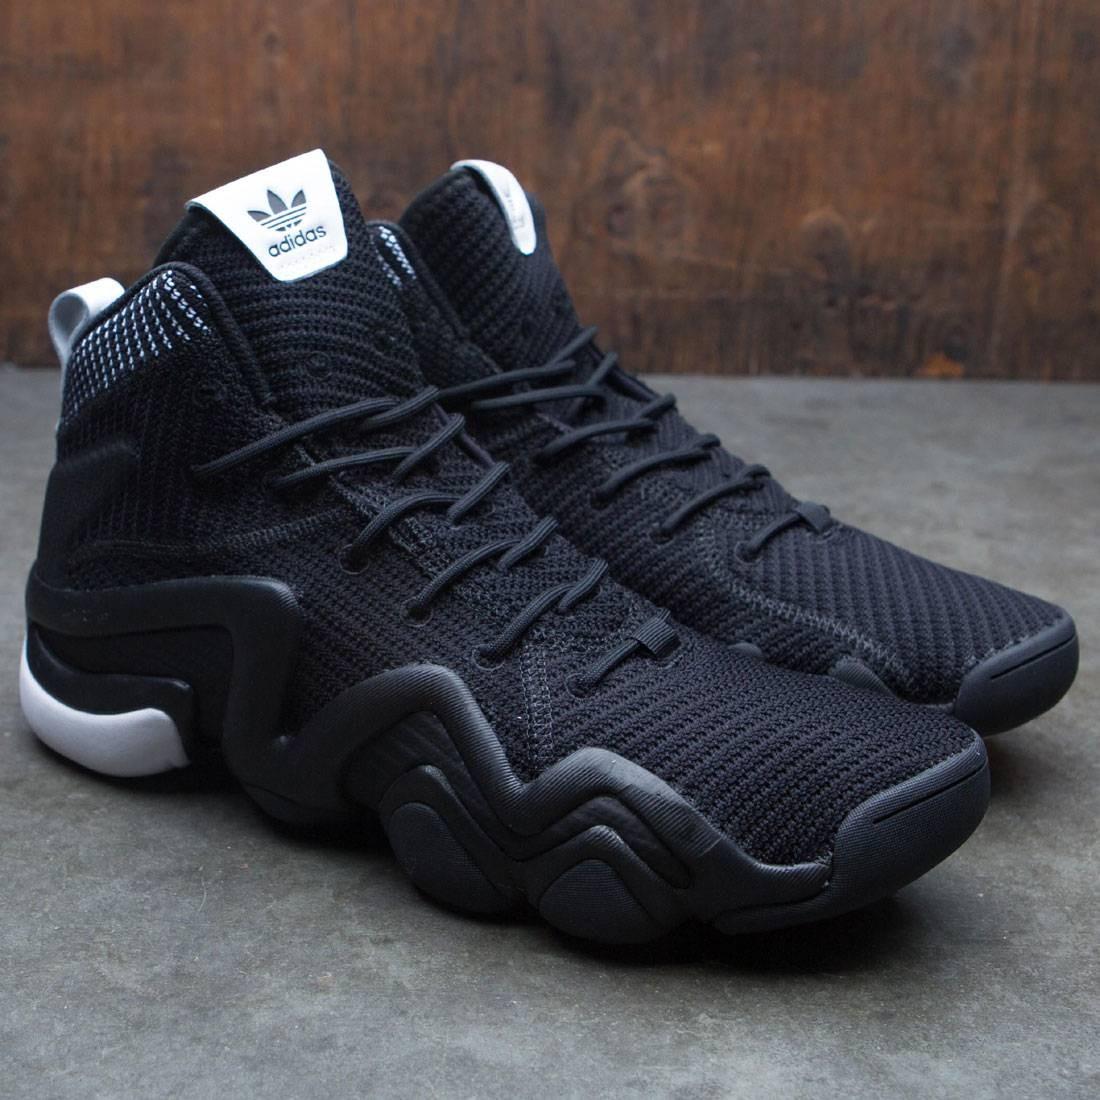 hot sale online 8adf5 d90c8 ... Adidas Men Crazy 8 ADV Primeknit (black core black footwear white) ...